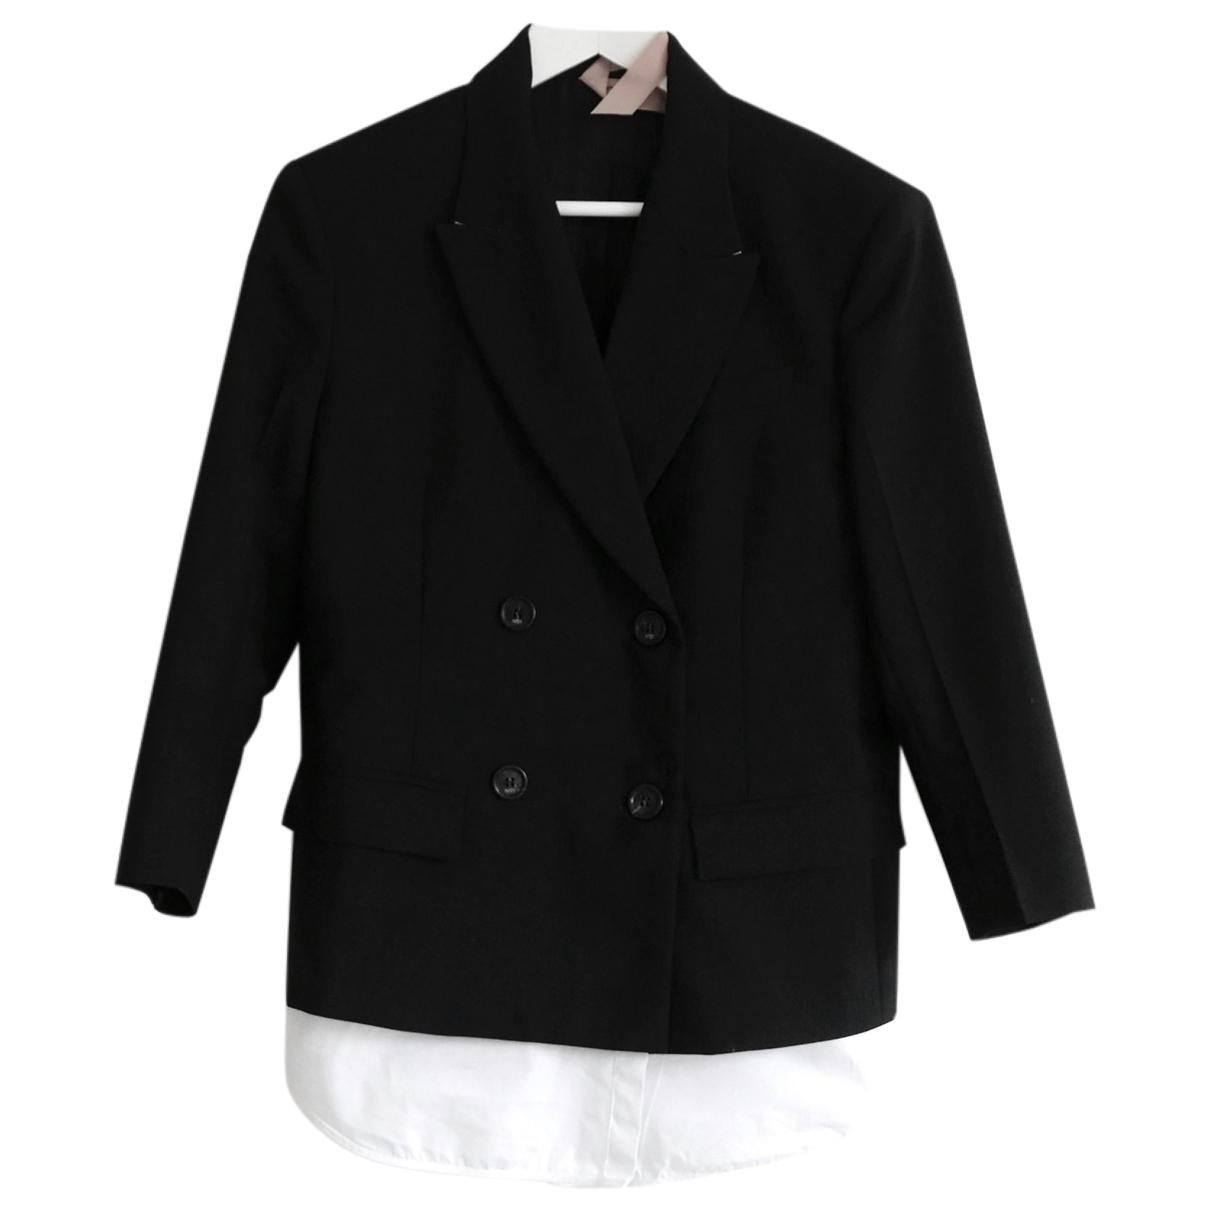 N°21 \N Black Wool jacket for Women 38 IT